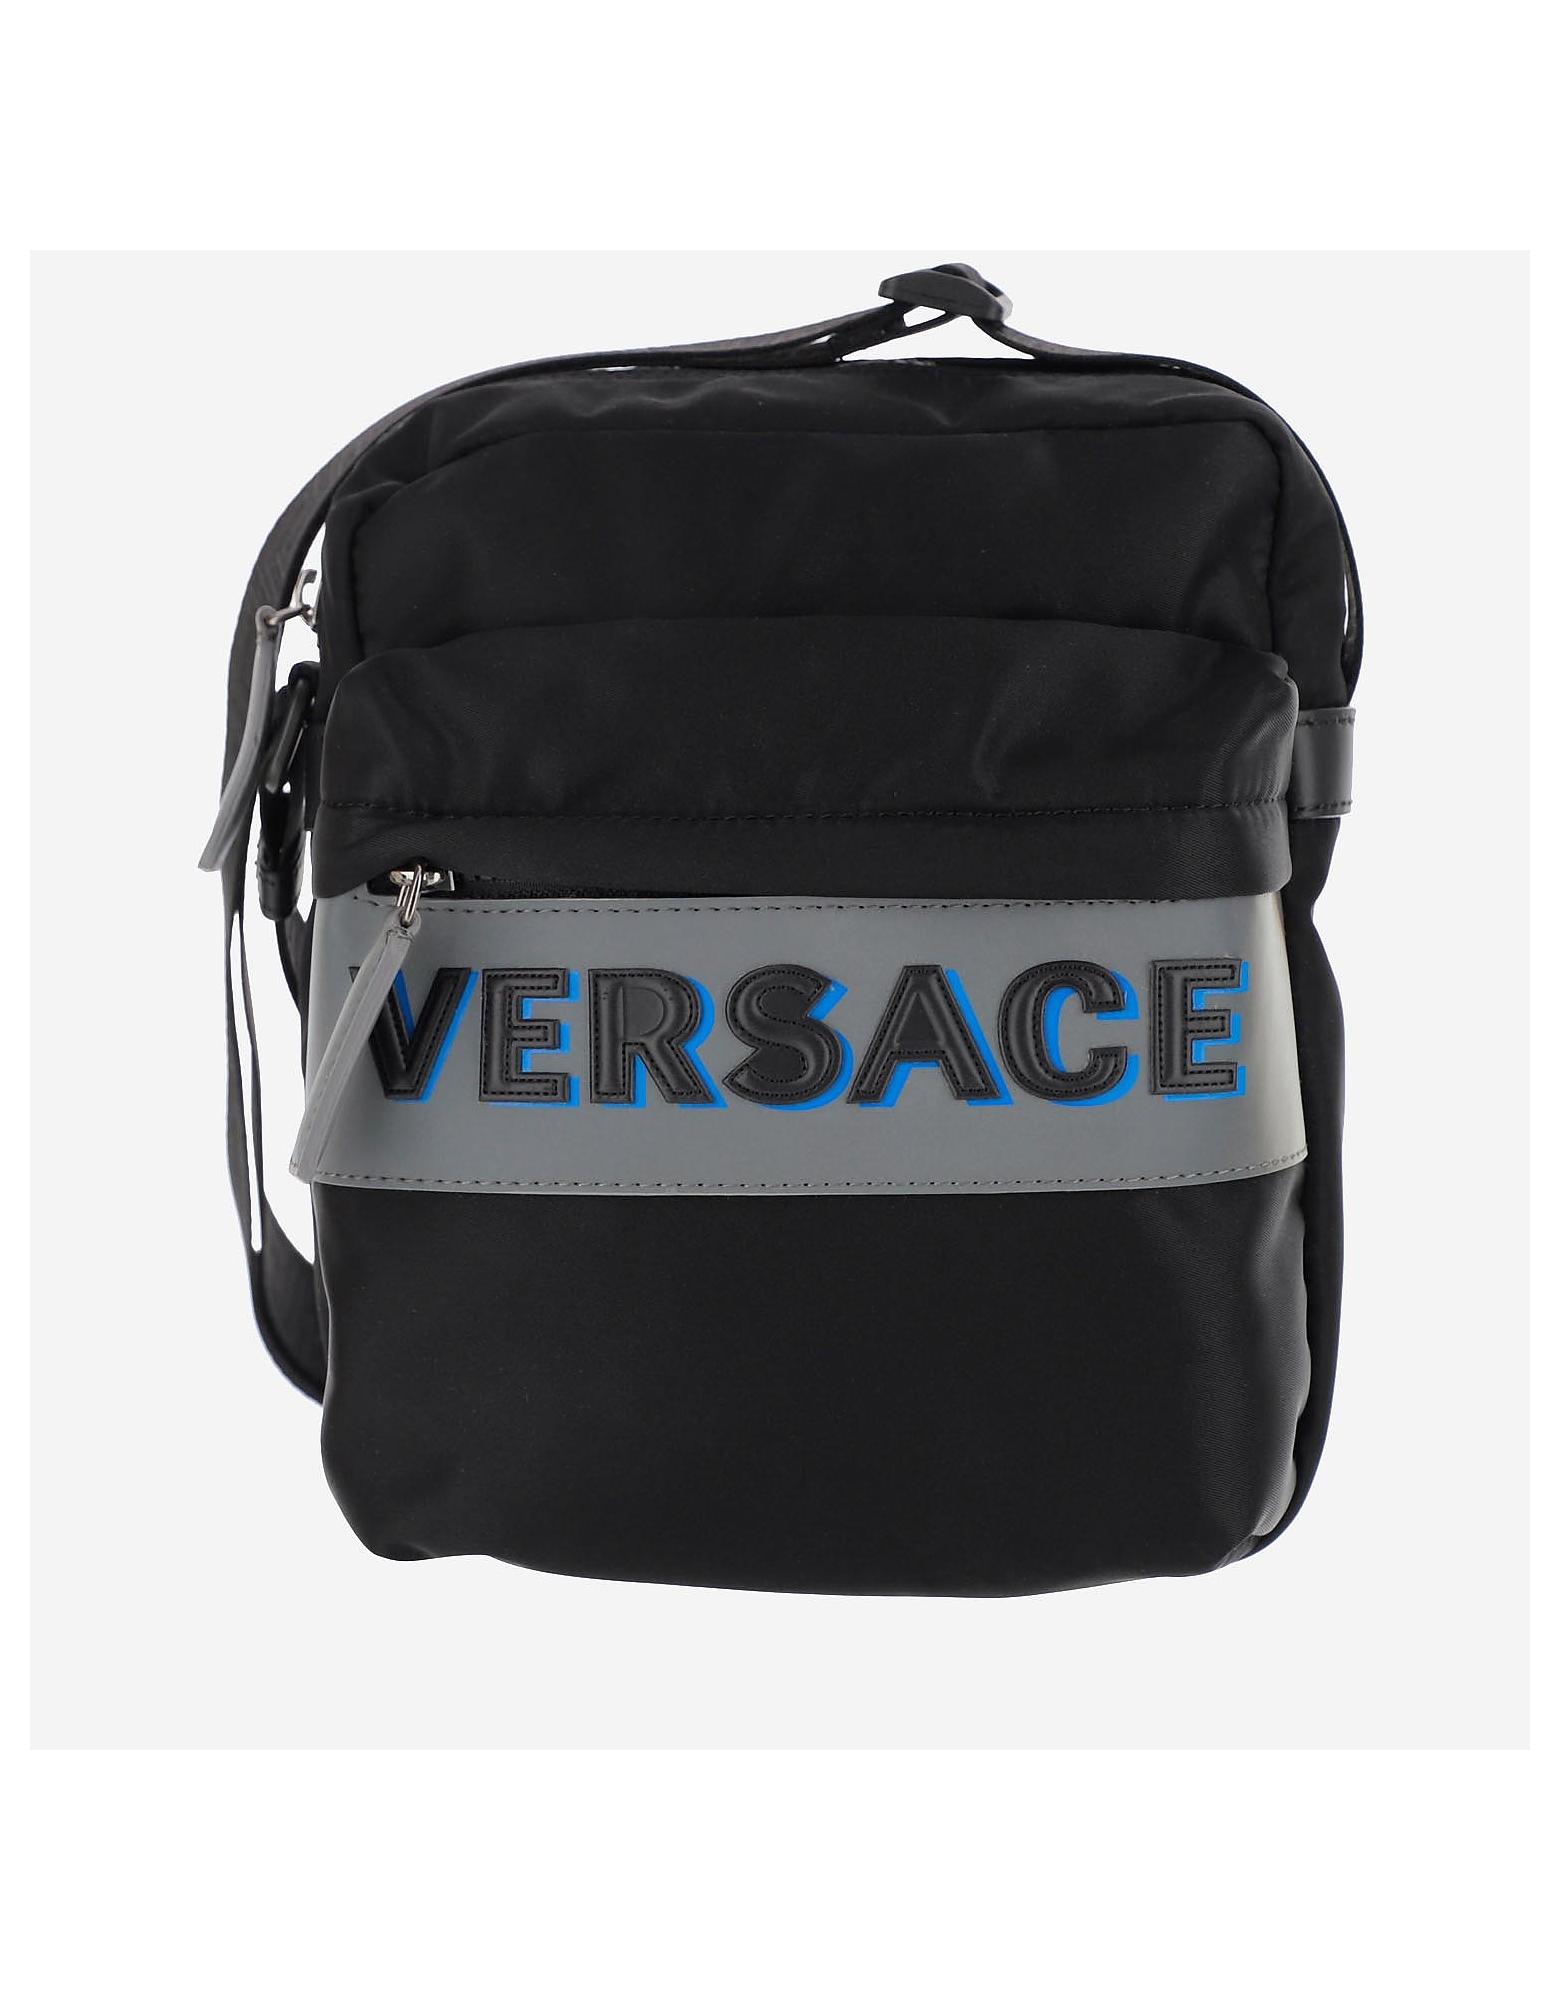 Versace Designer Men's Bags, Versace Nylon Messenger Bag